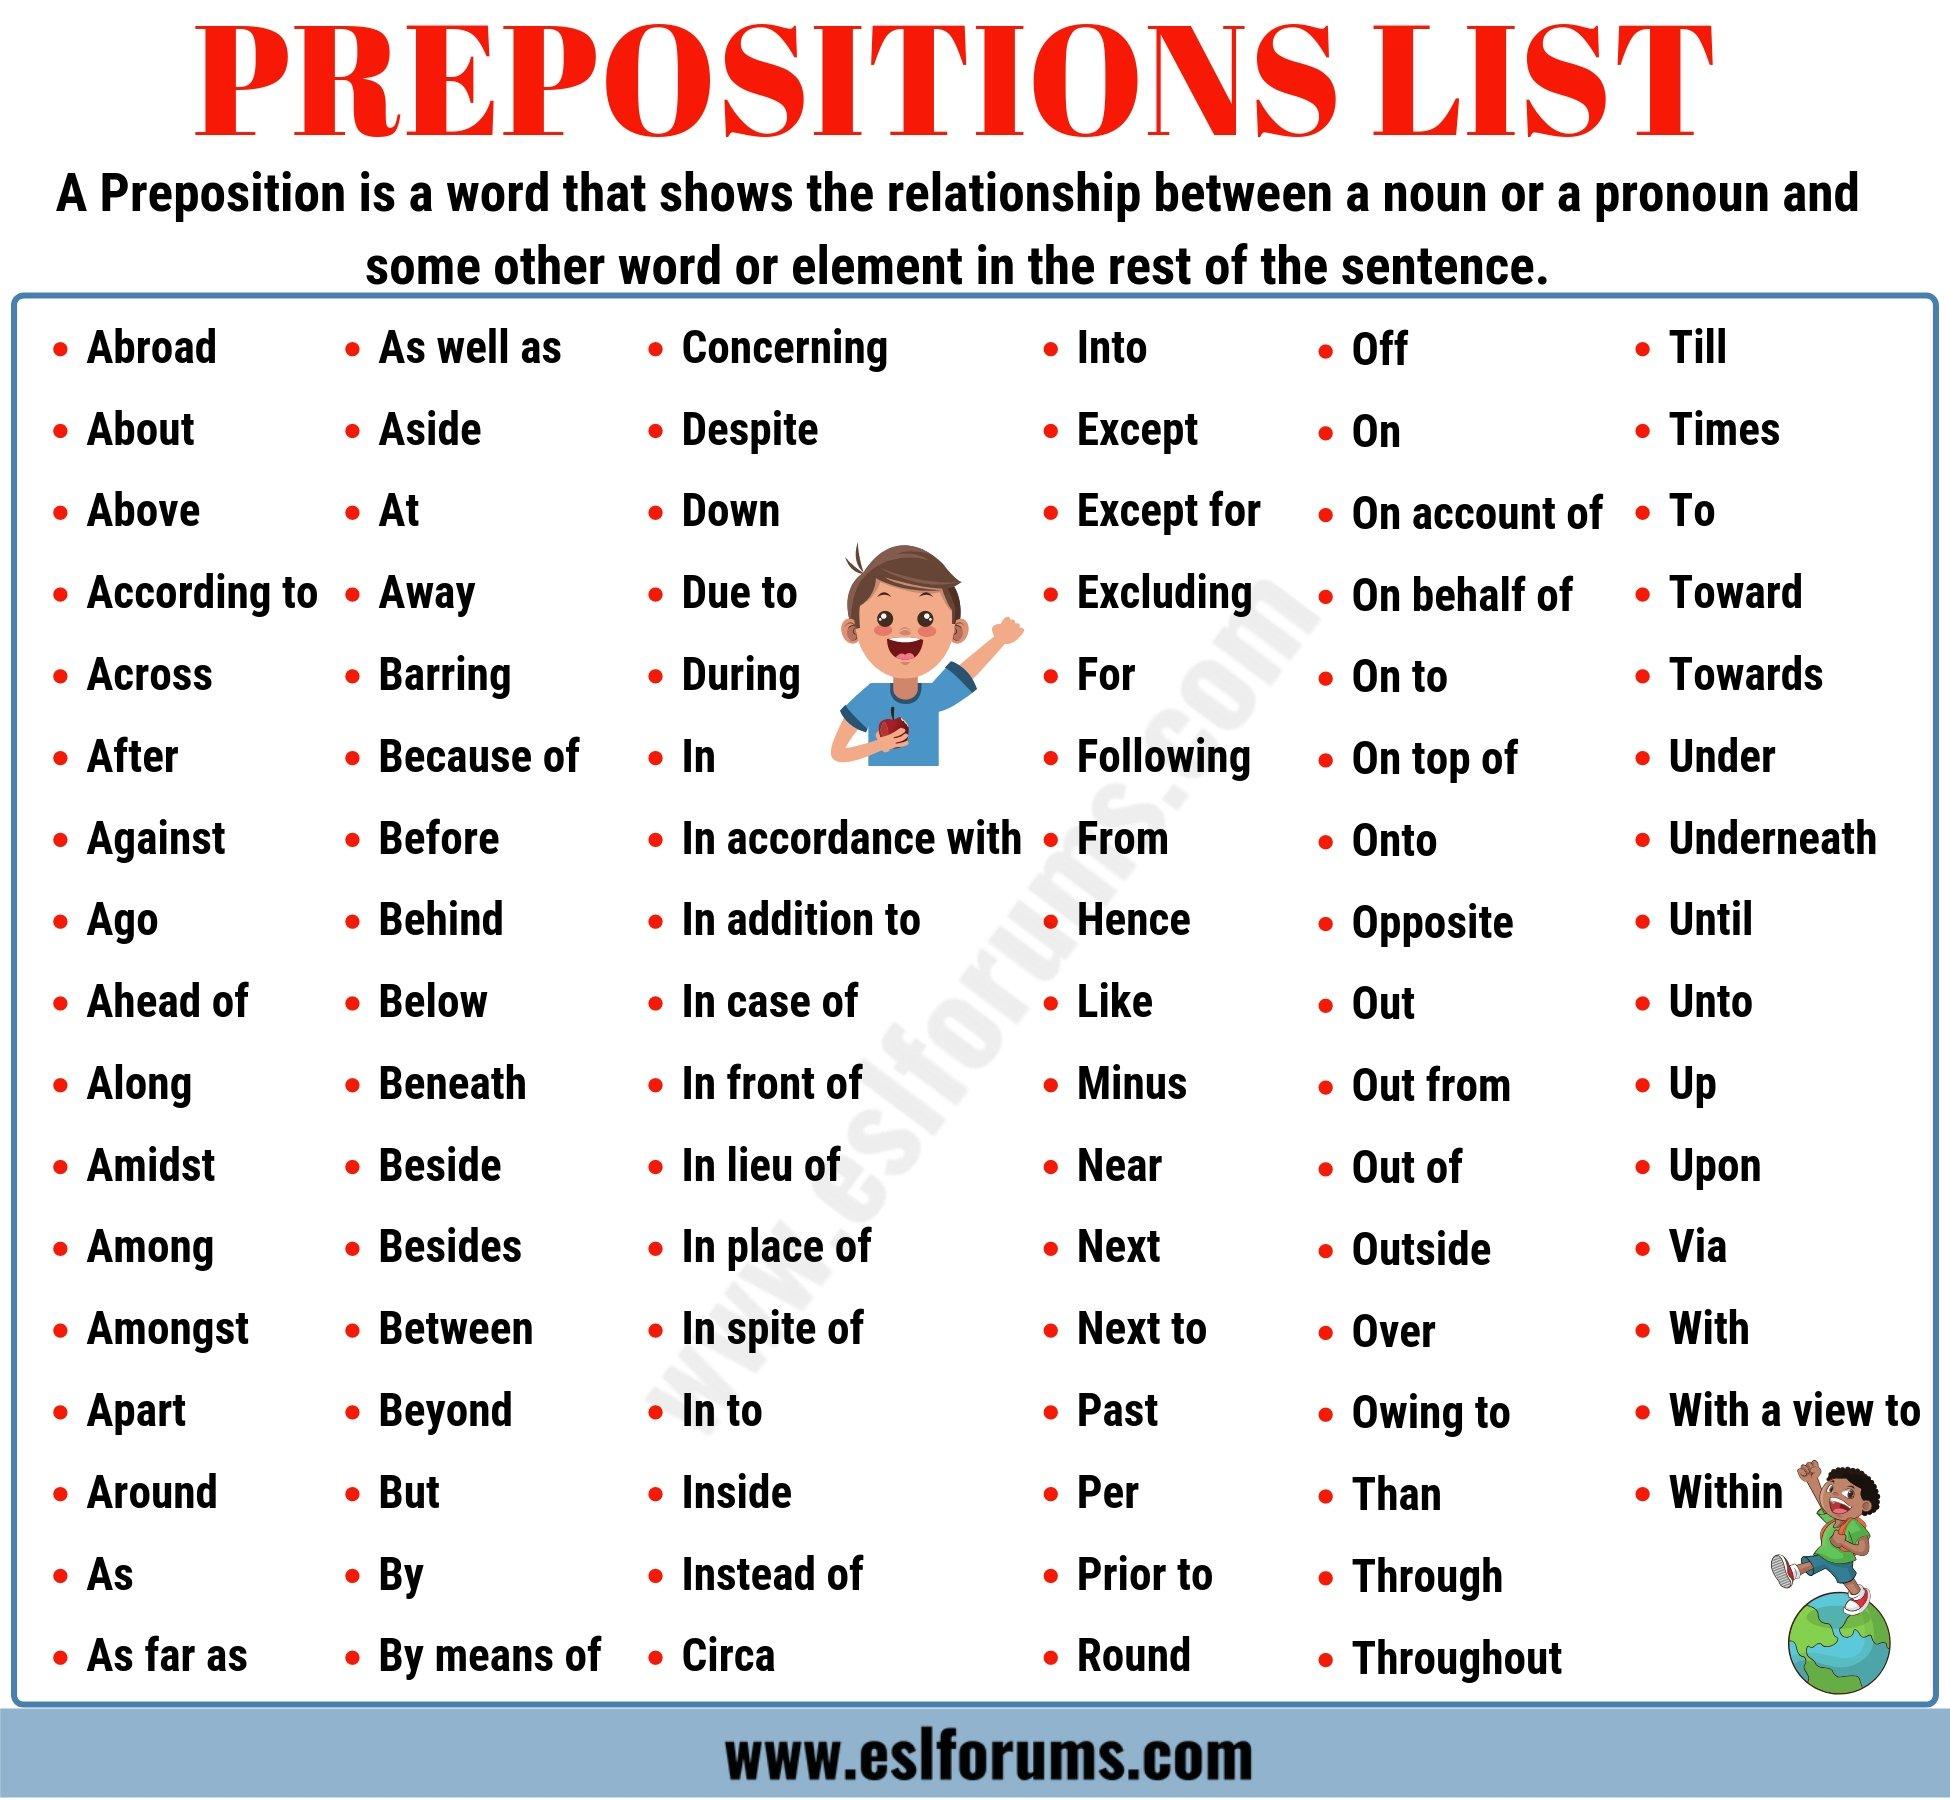 Preposition In Learn In Marathi All Complate: List Of Prepositions: 100 Important Prepositions In